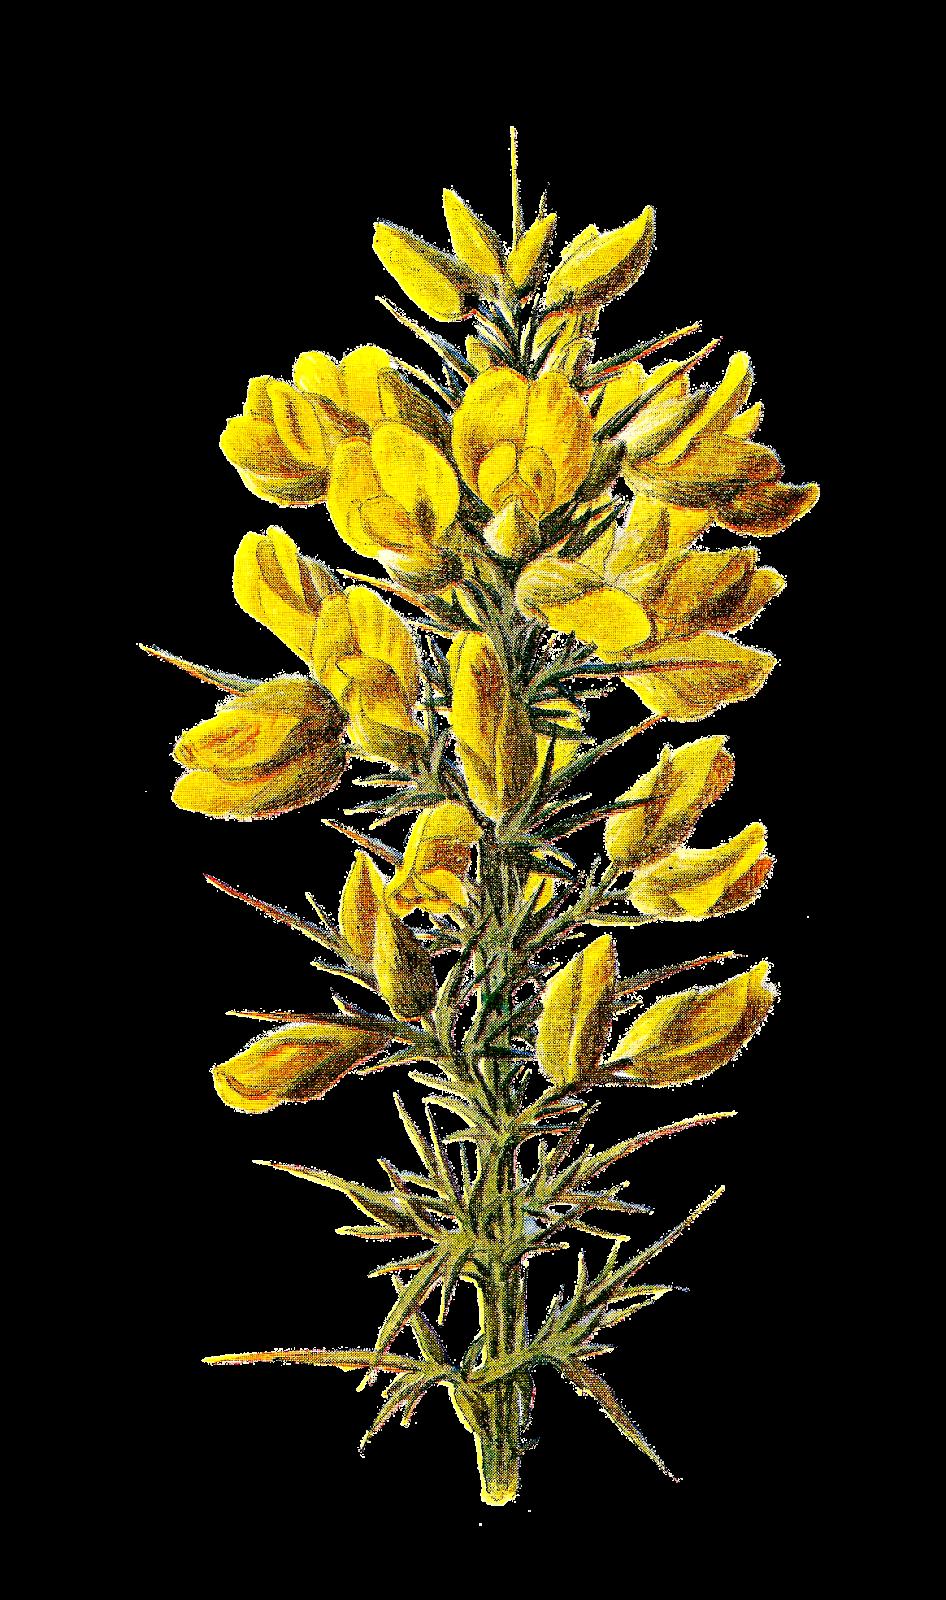 Antique Images: Wildflower Stock Illustration Digital ...